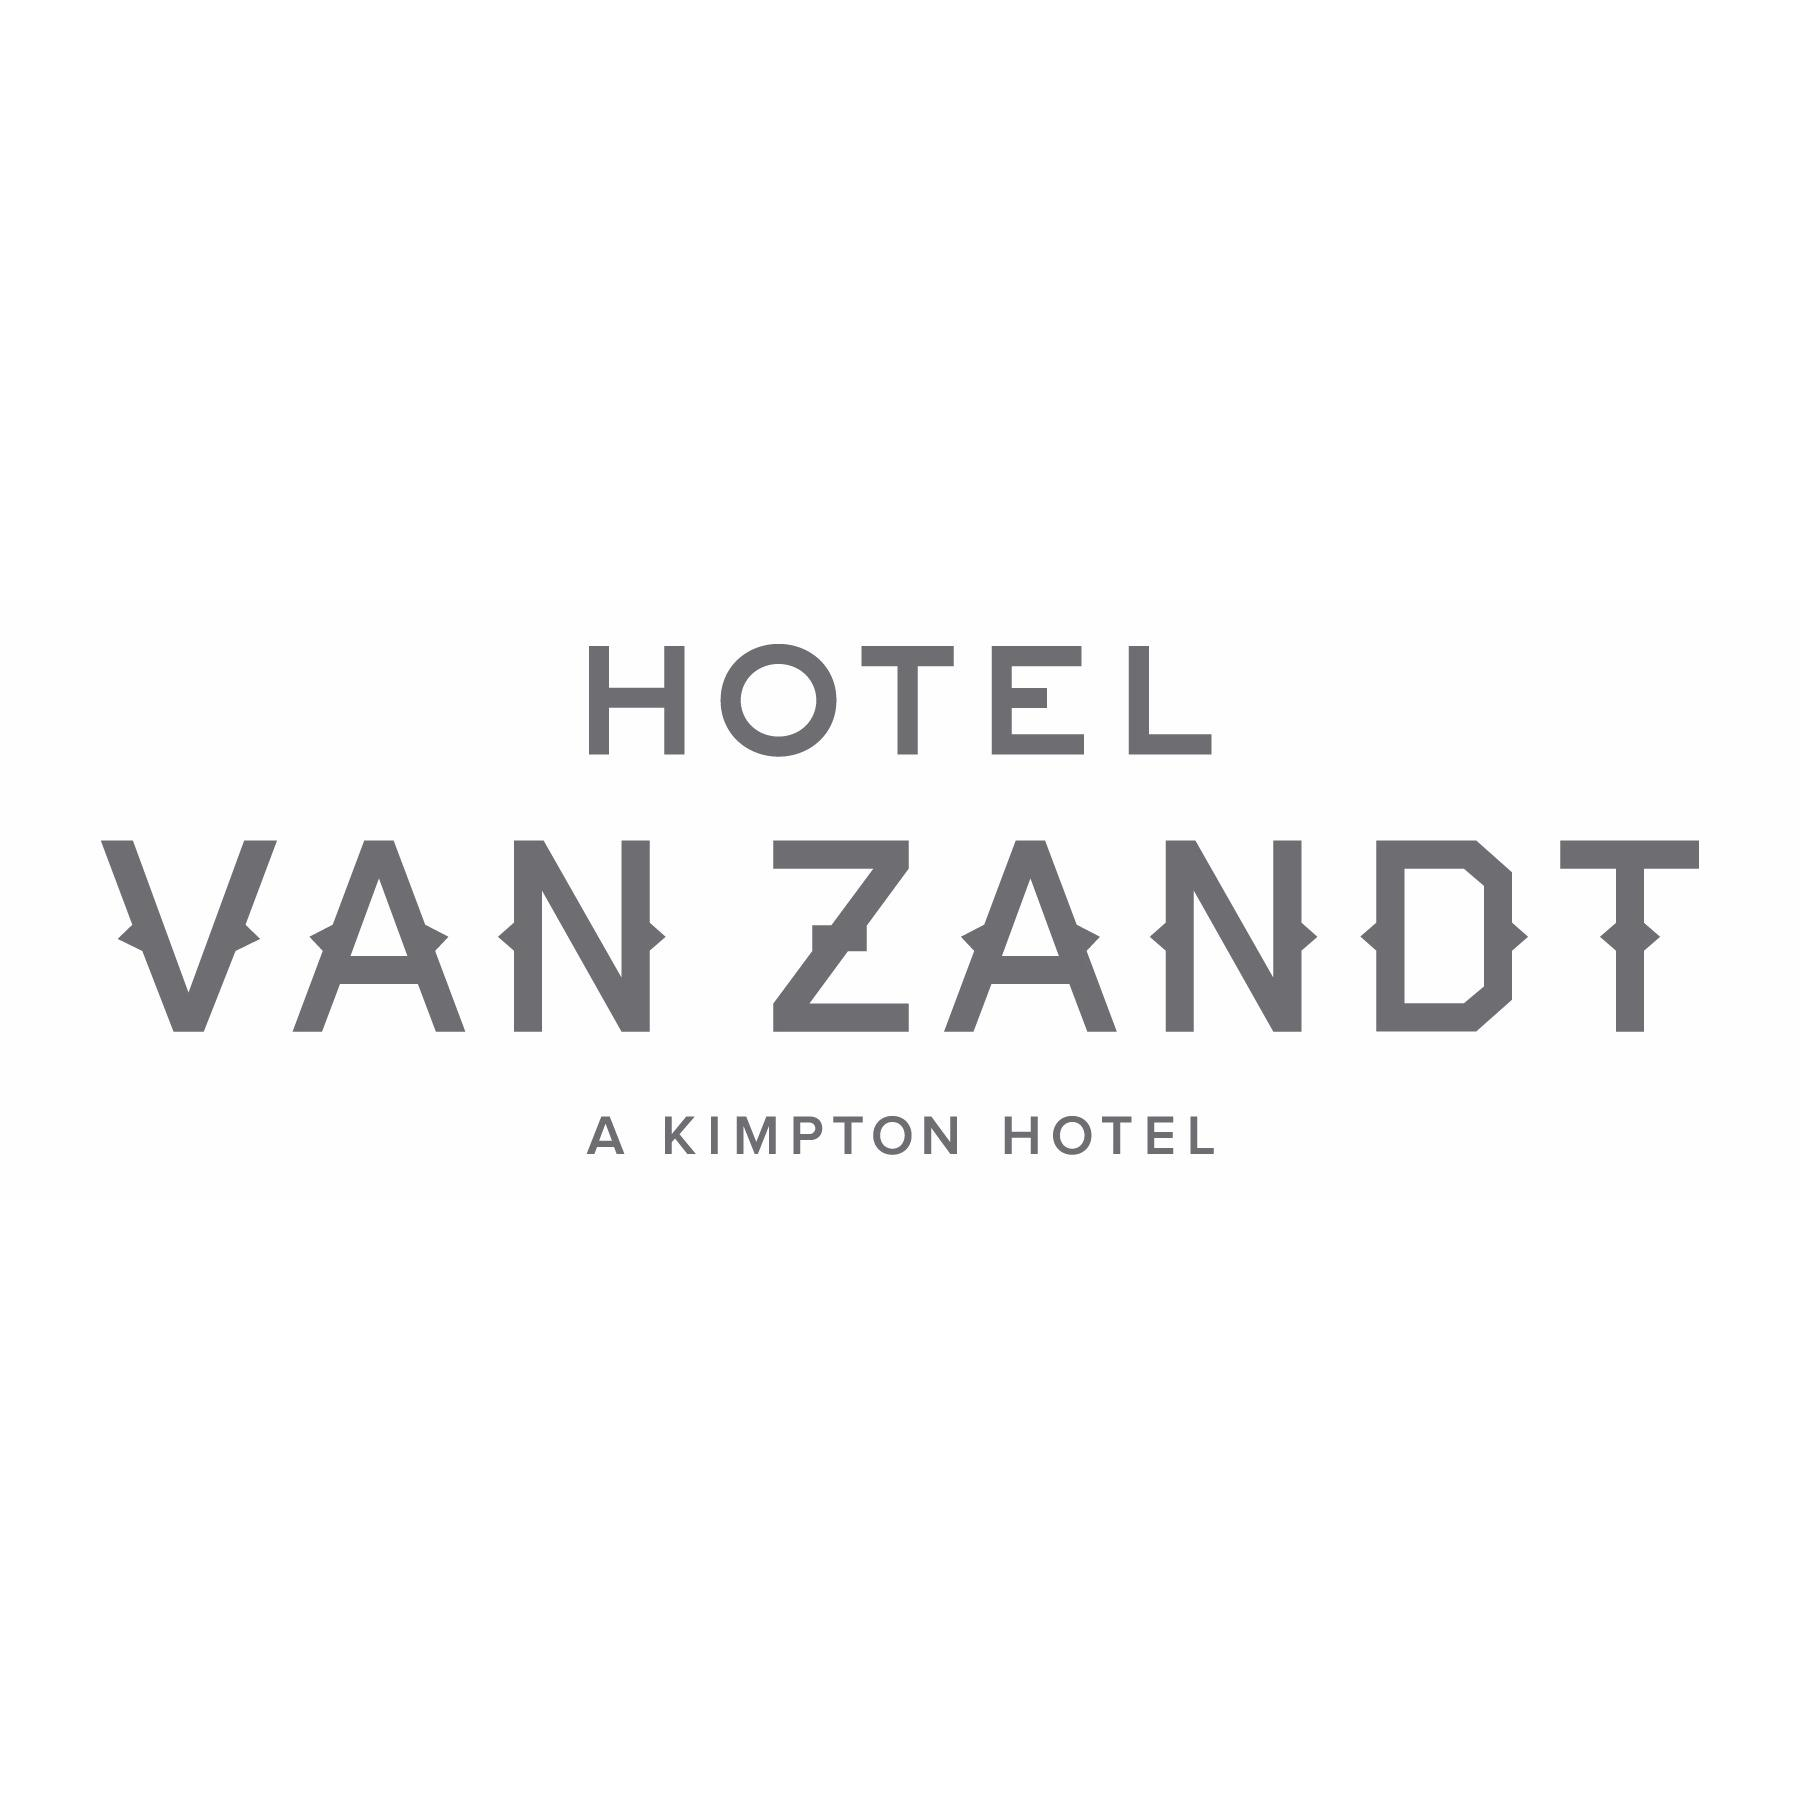 Hotel Van Zandt, a Kimpton Hotel